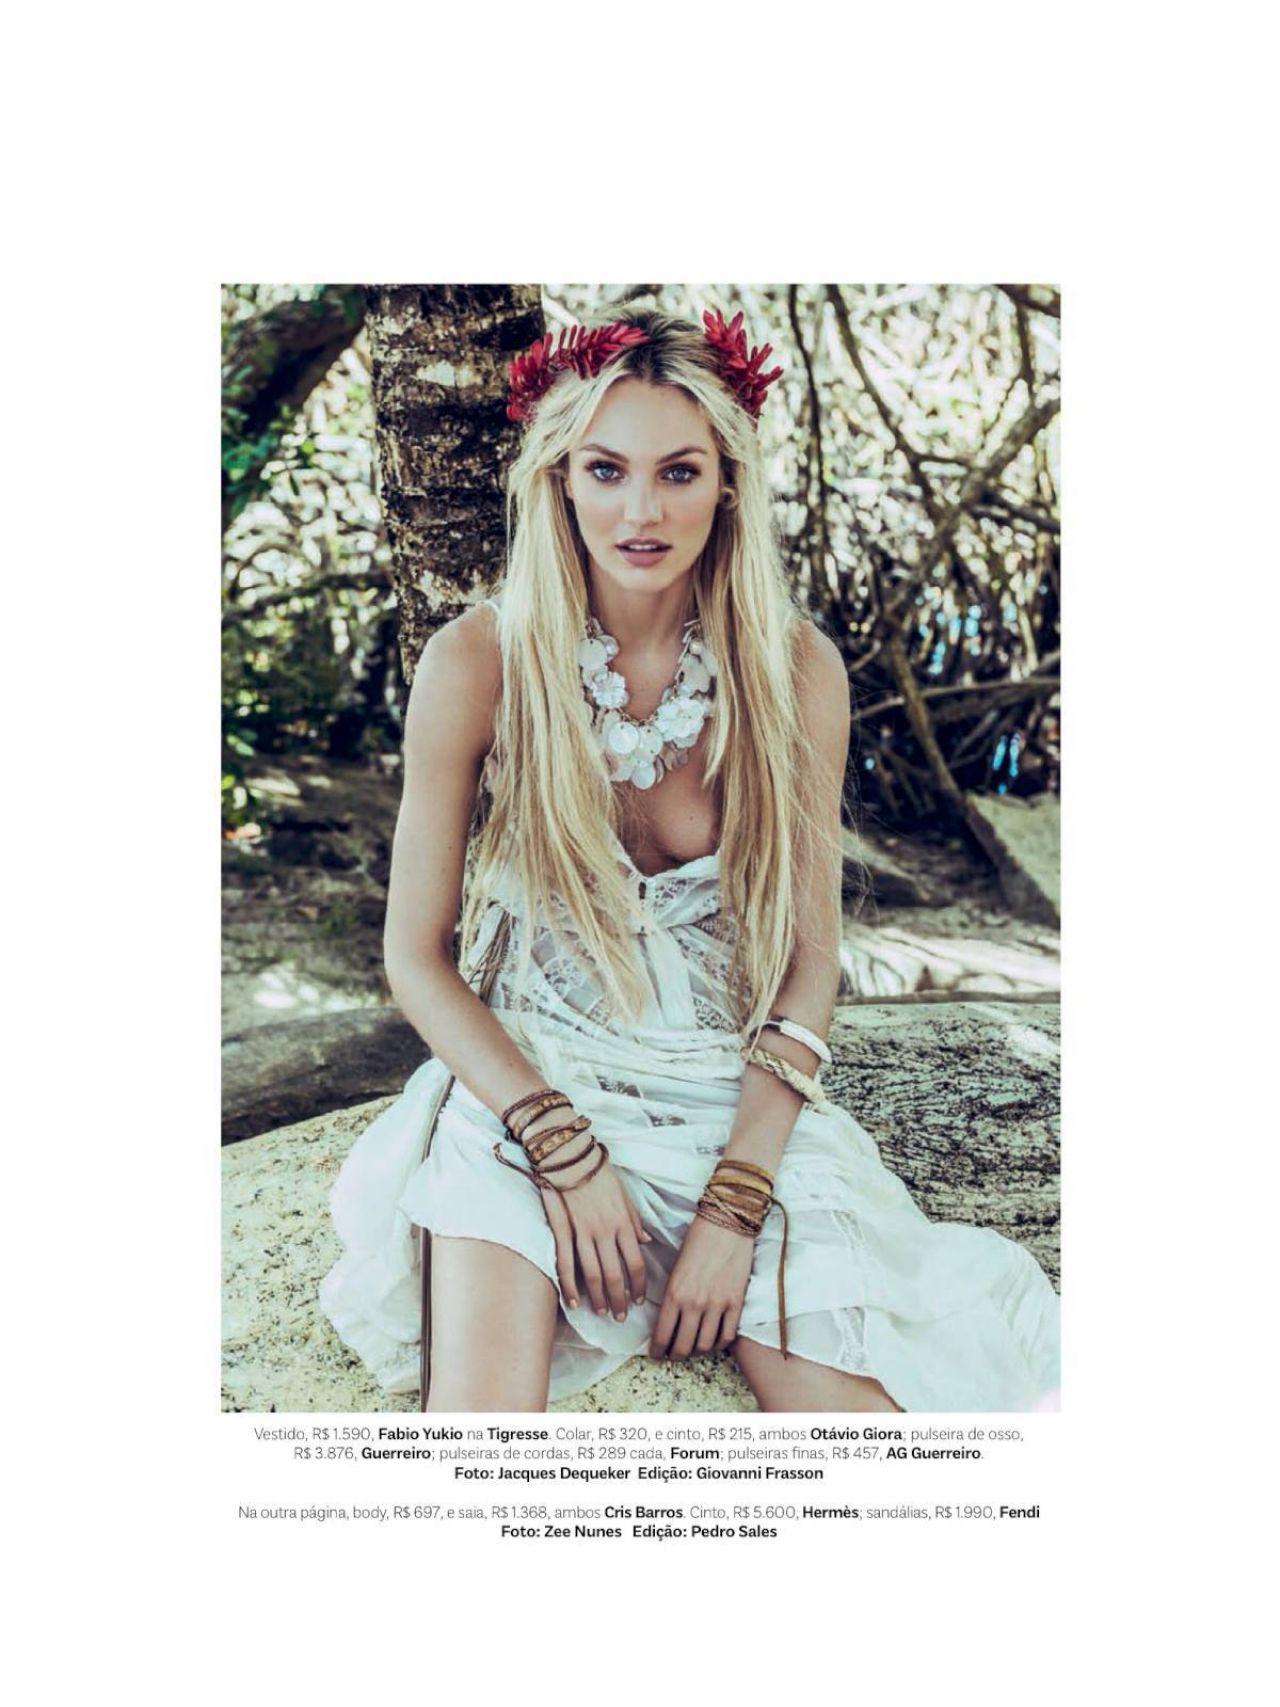 Candice Swanepoel Photoshoot for Vogue Brazil -03 | GotCeleb